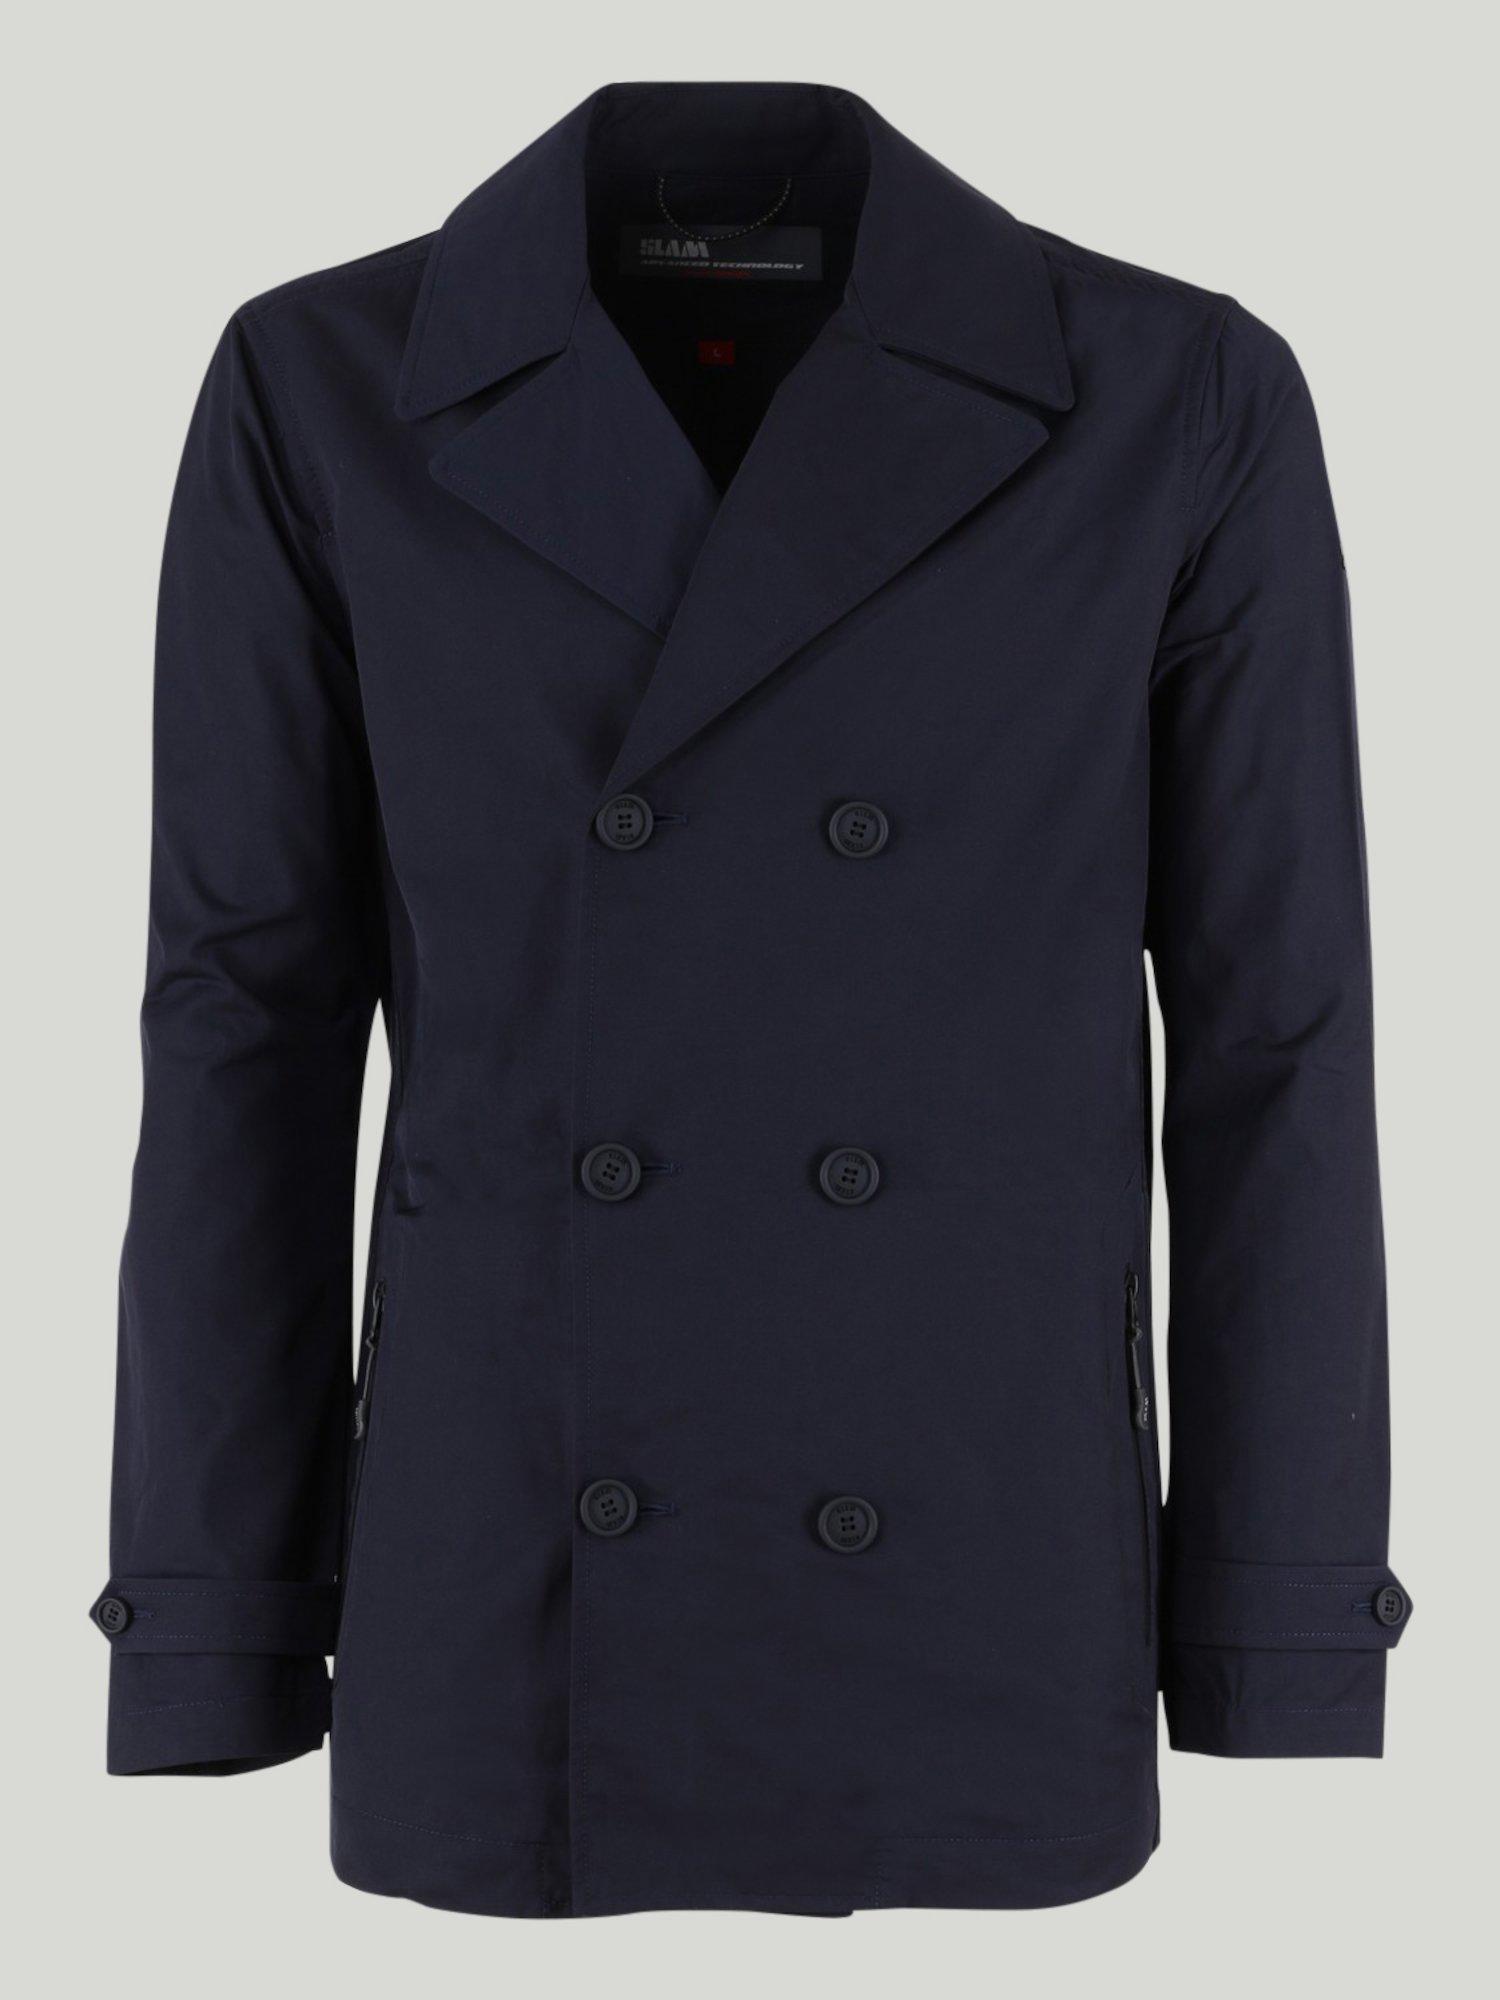 Bailer jacket - Navy